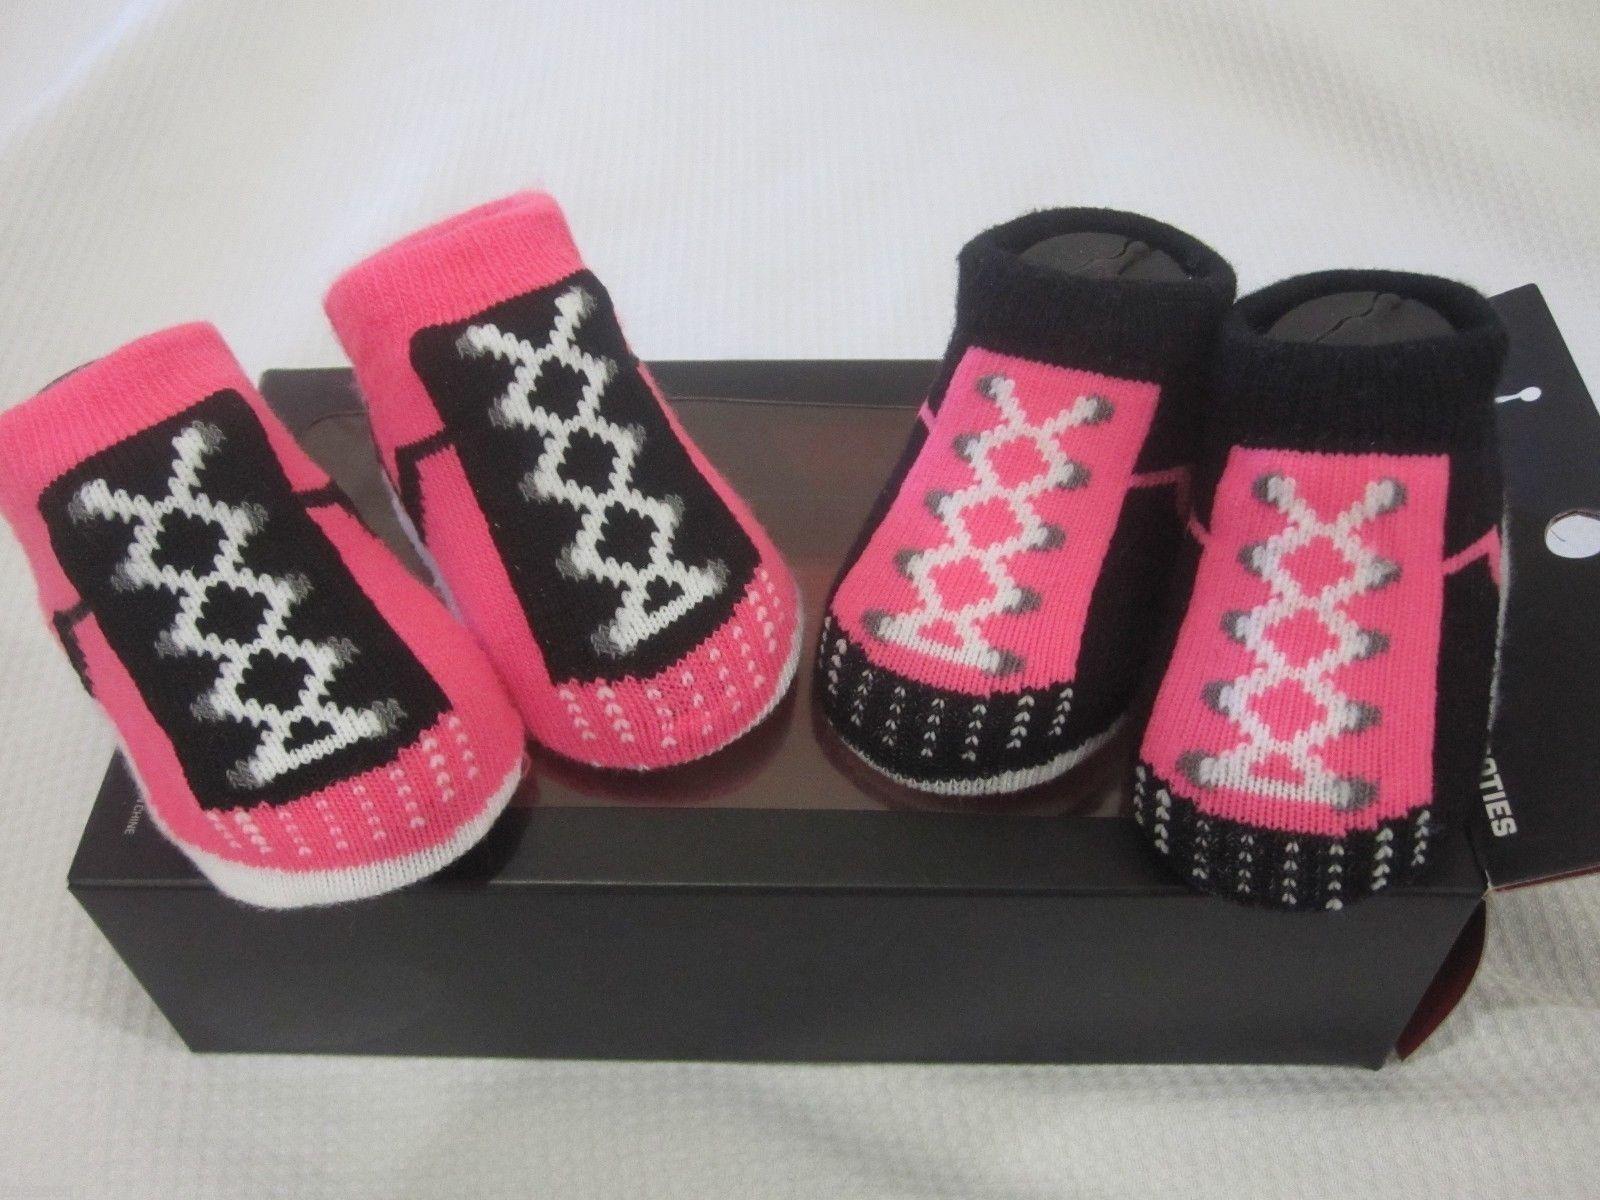 nib nike air pink baby newborn booties shoes